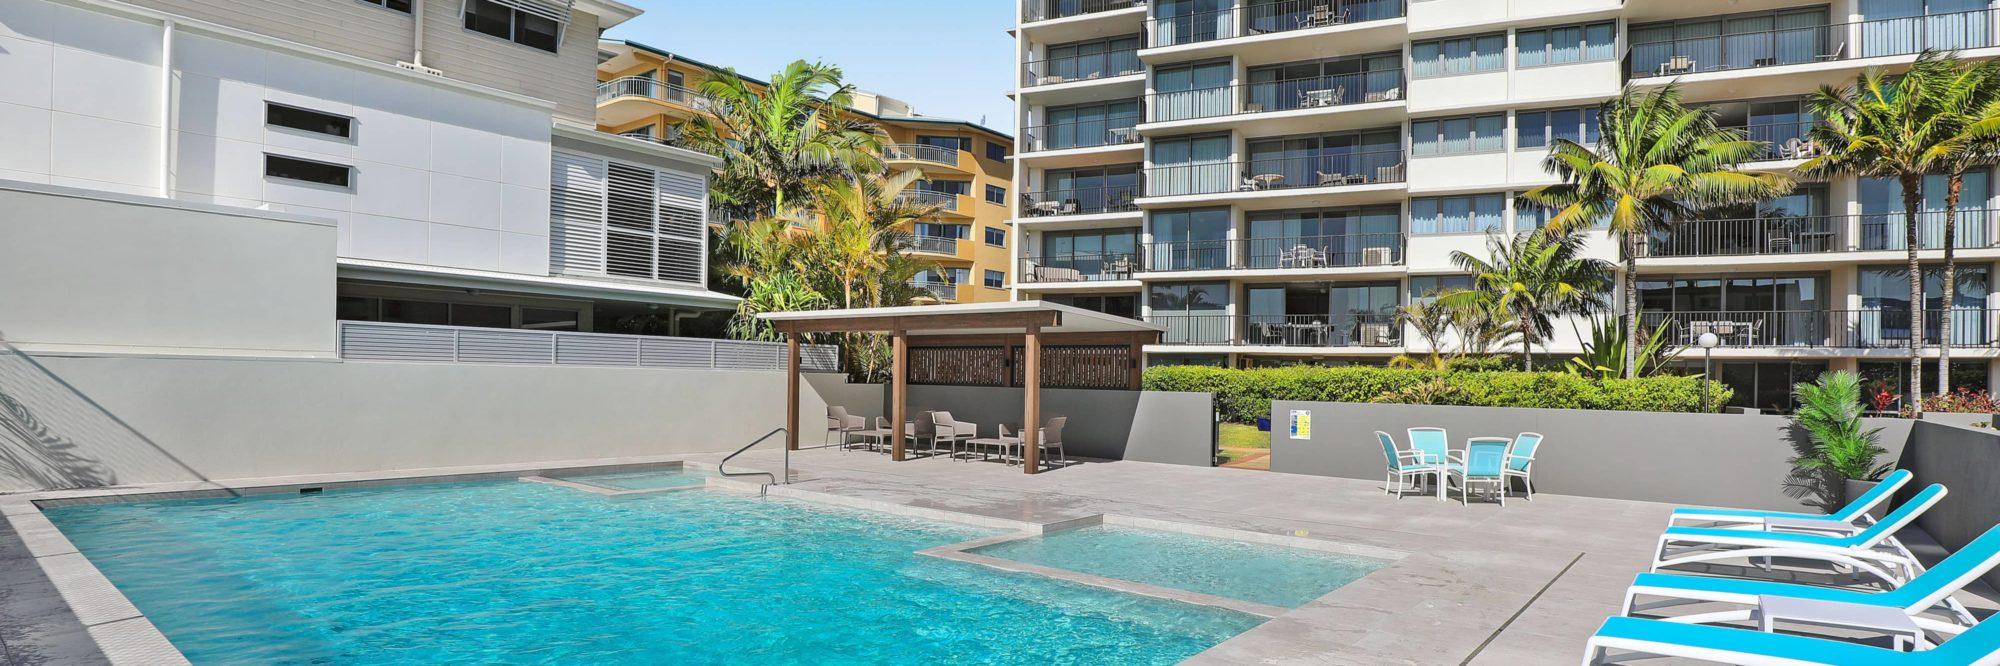 maroochydore beachside resort majorca isle. Black Bedroom Furniture Sets. Home Design Ideas